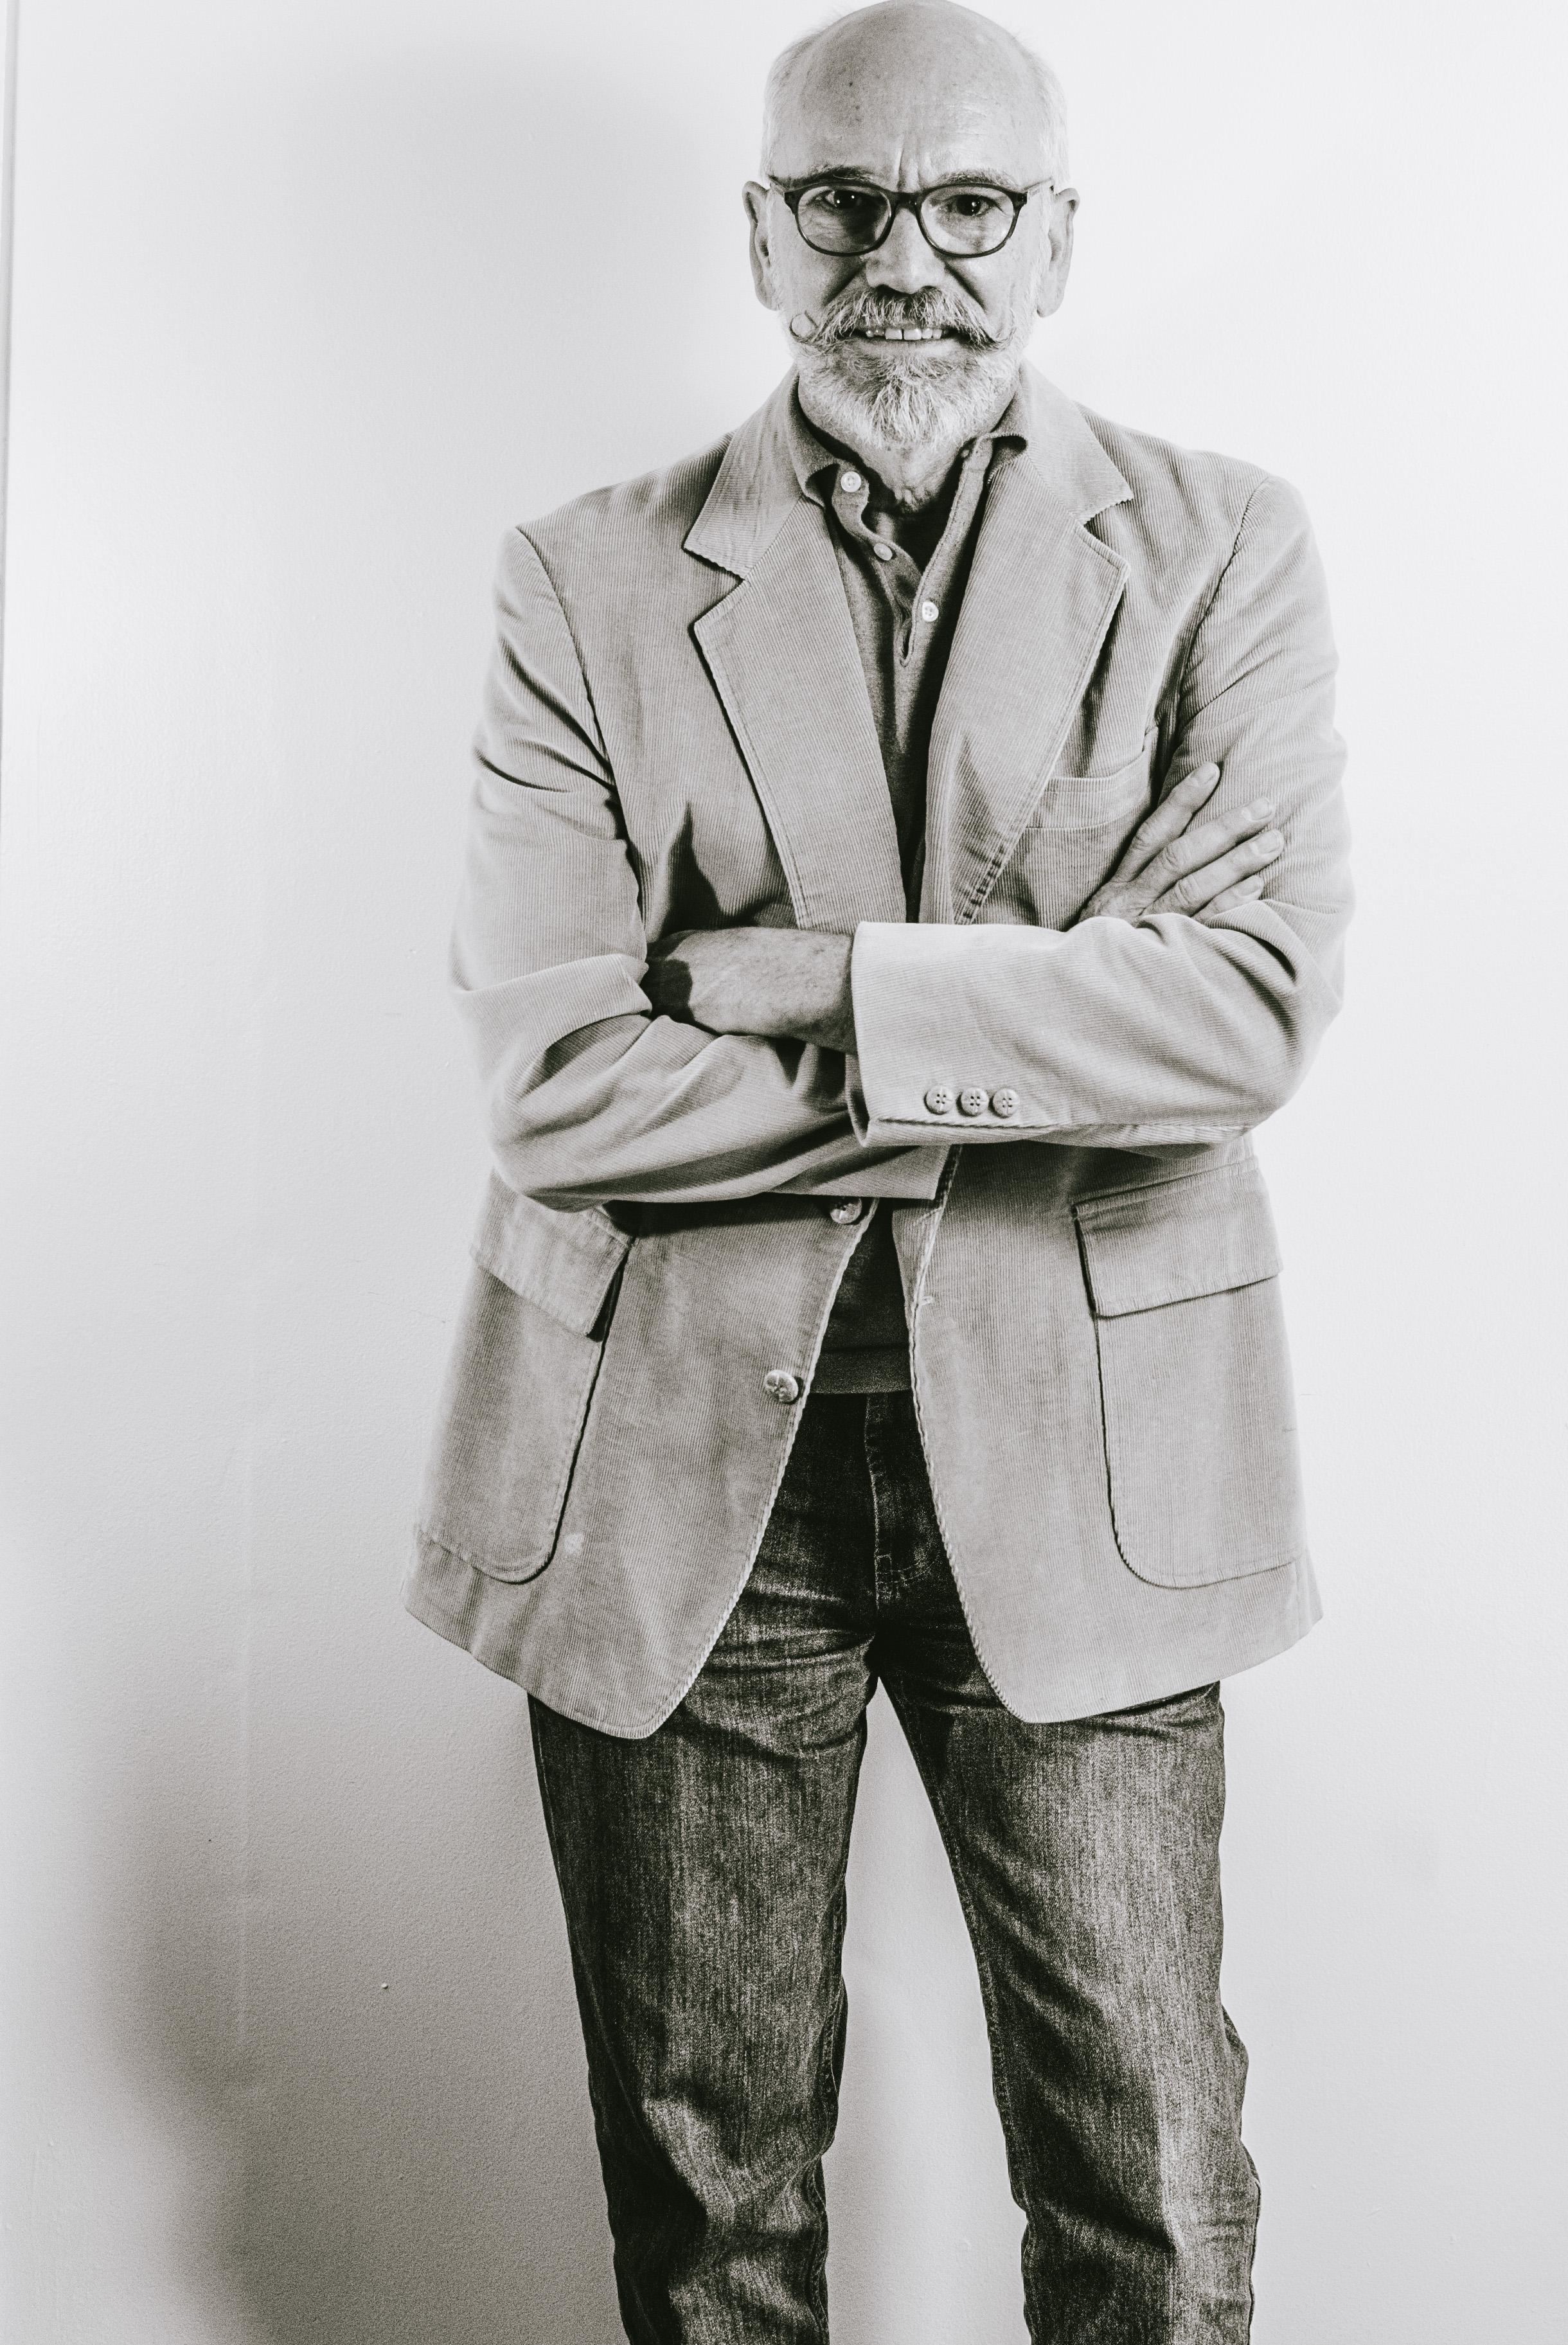 John J Kells